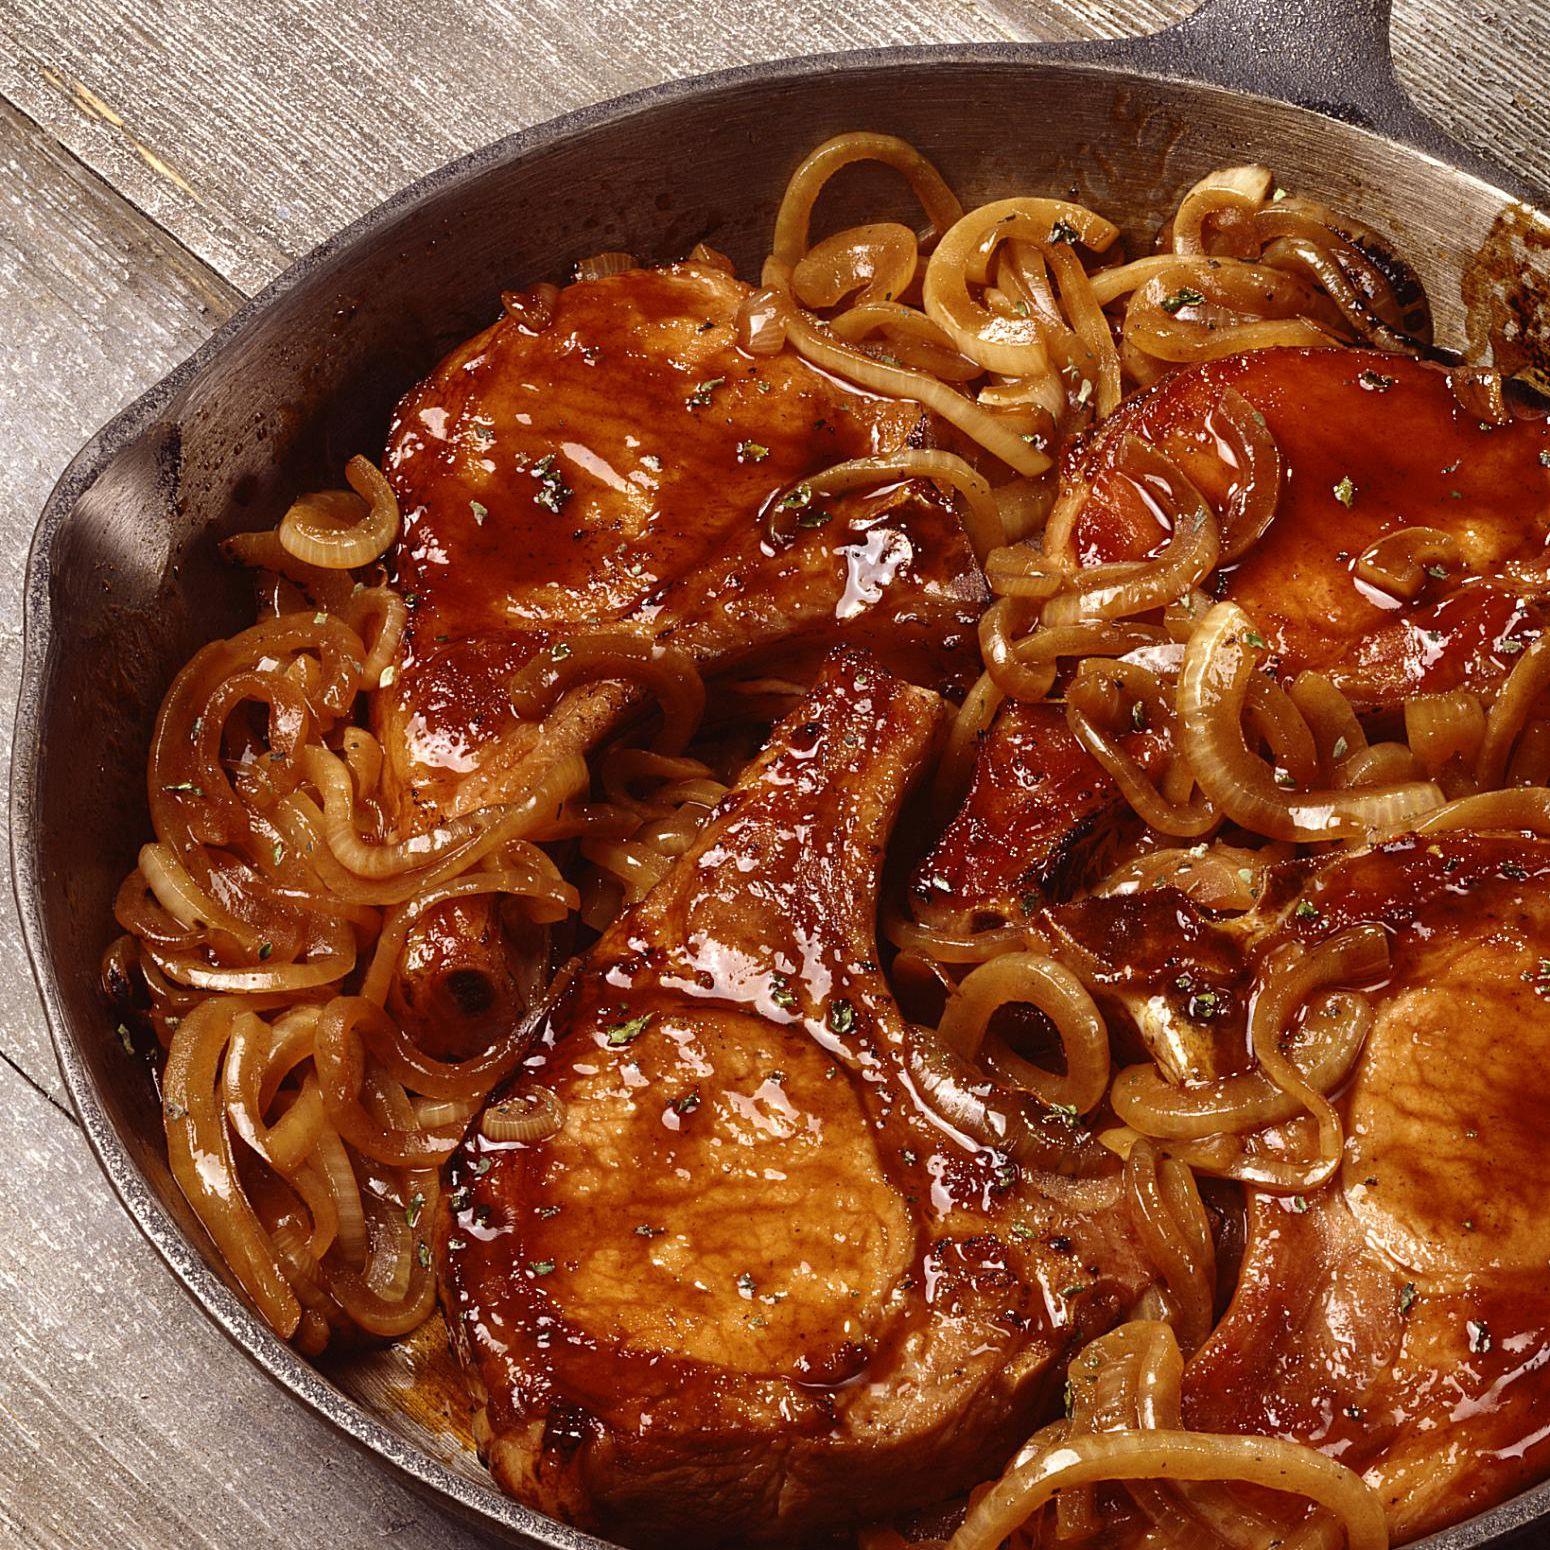 pork chop recipes with caramelized onions Caramelized Onion Smothered Pork Chops